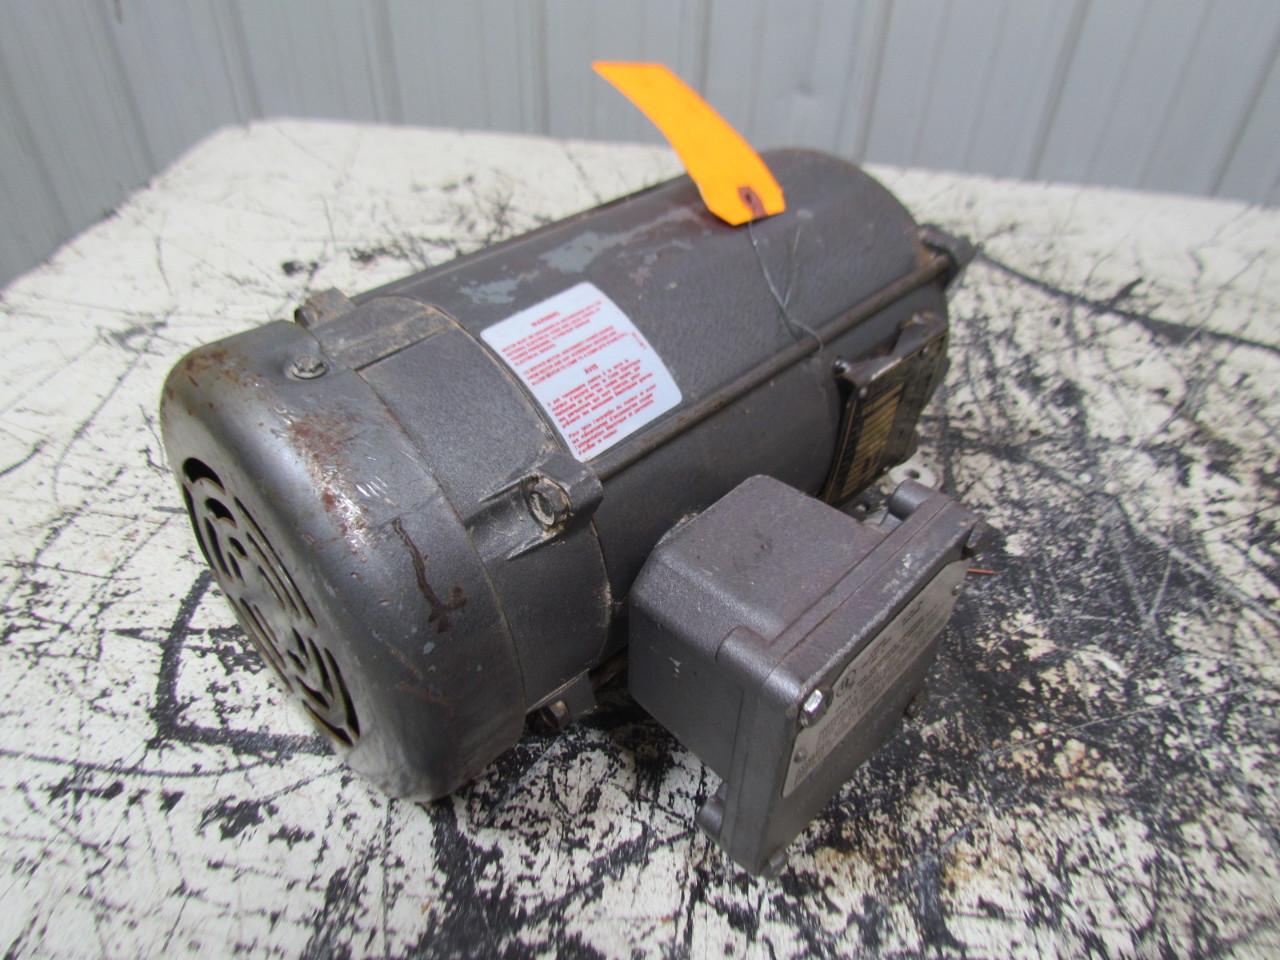 Baldor m7035t 1 5hp electric motor explosion proof 3ph for Explosion proof dc motor